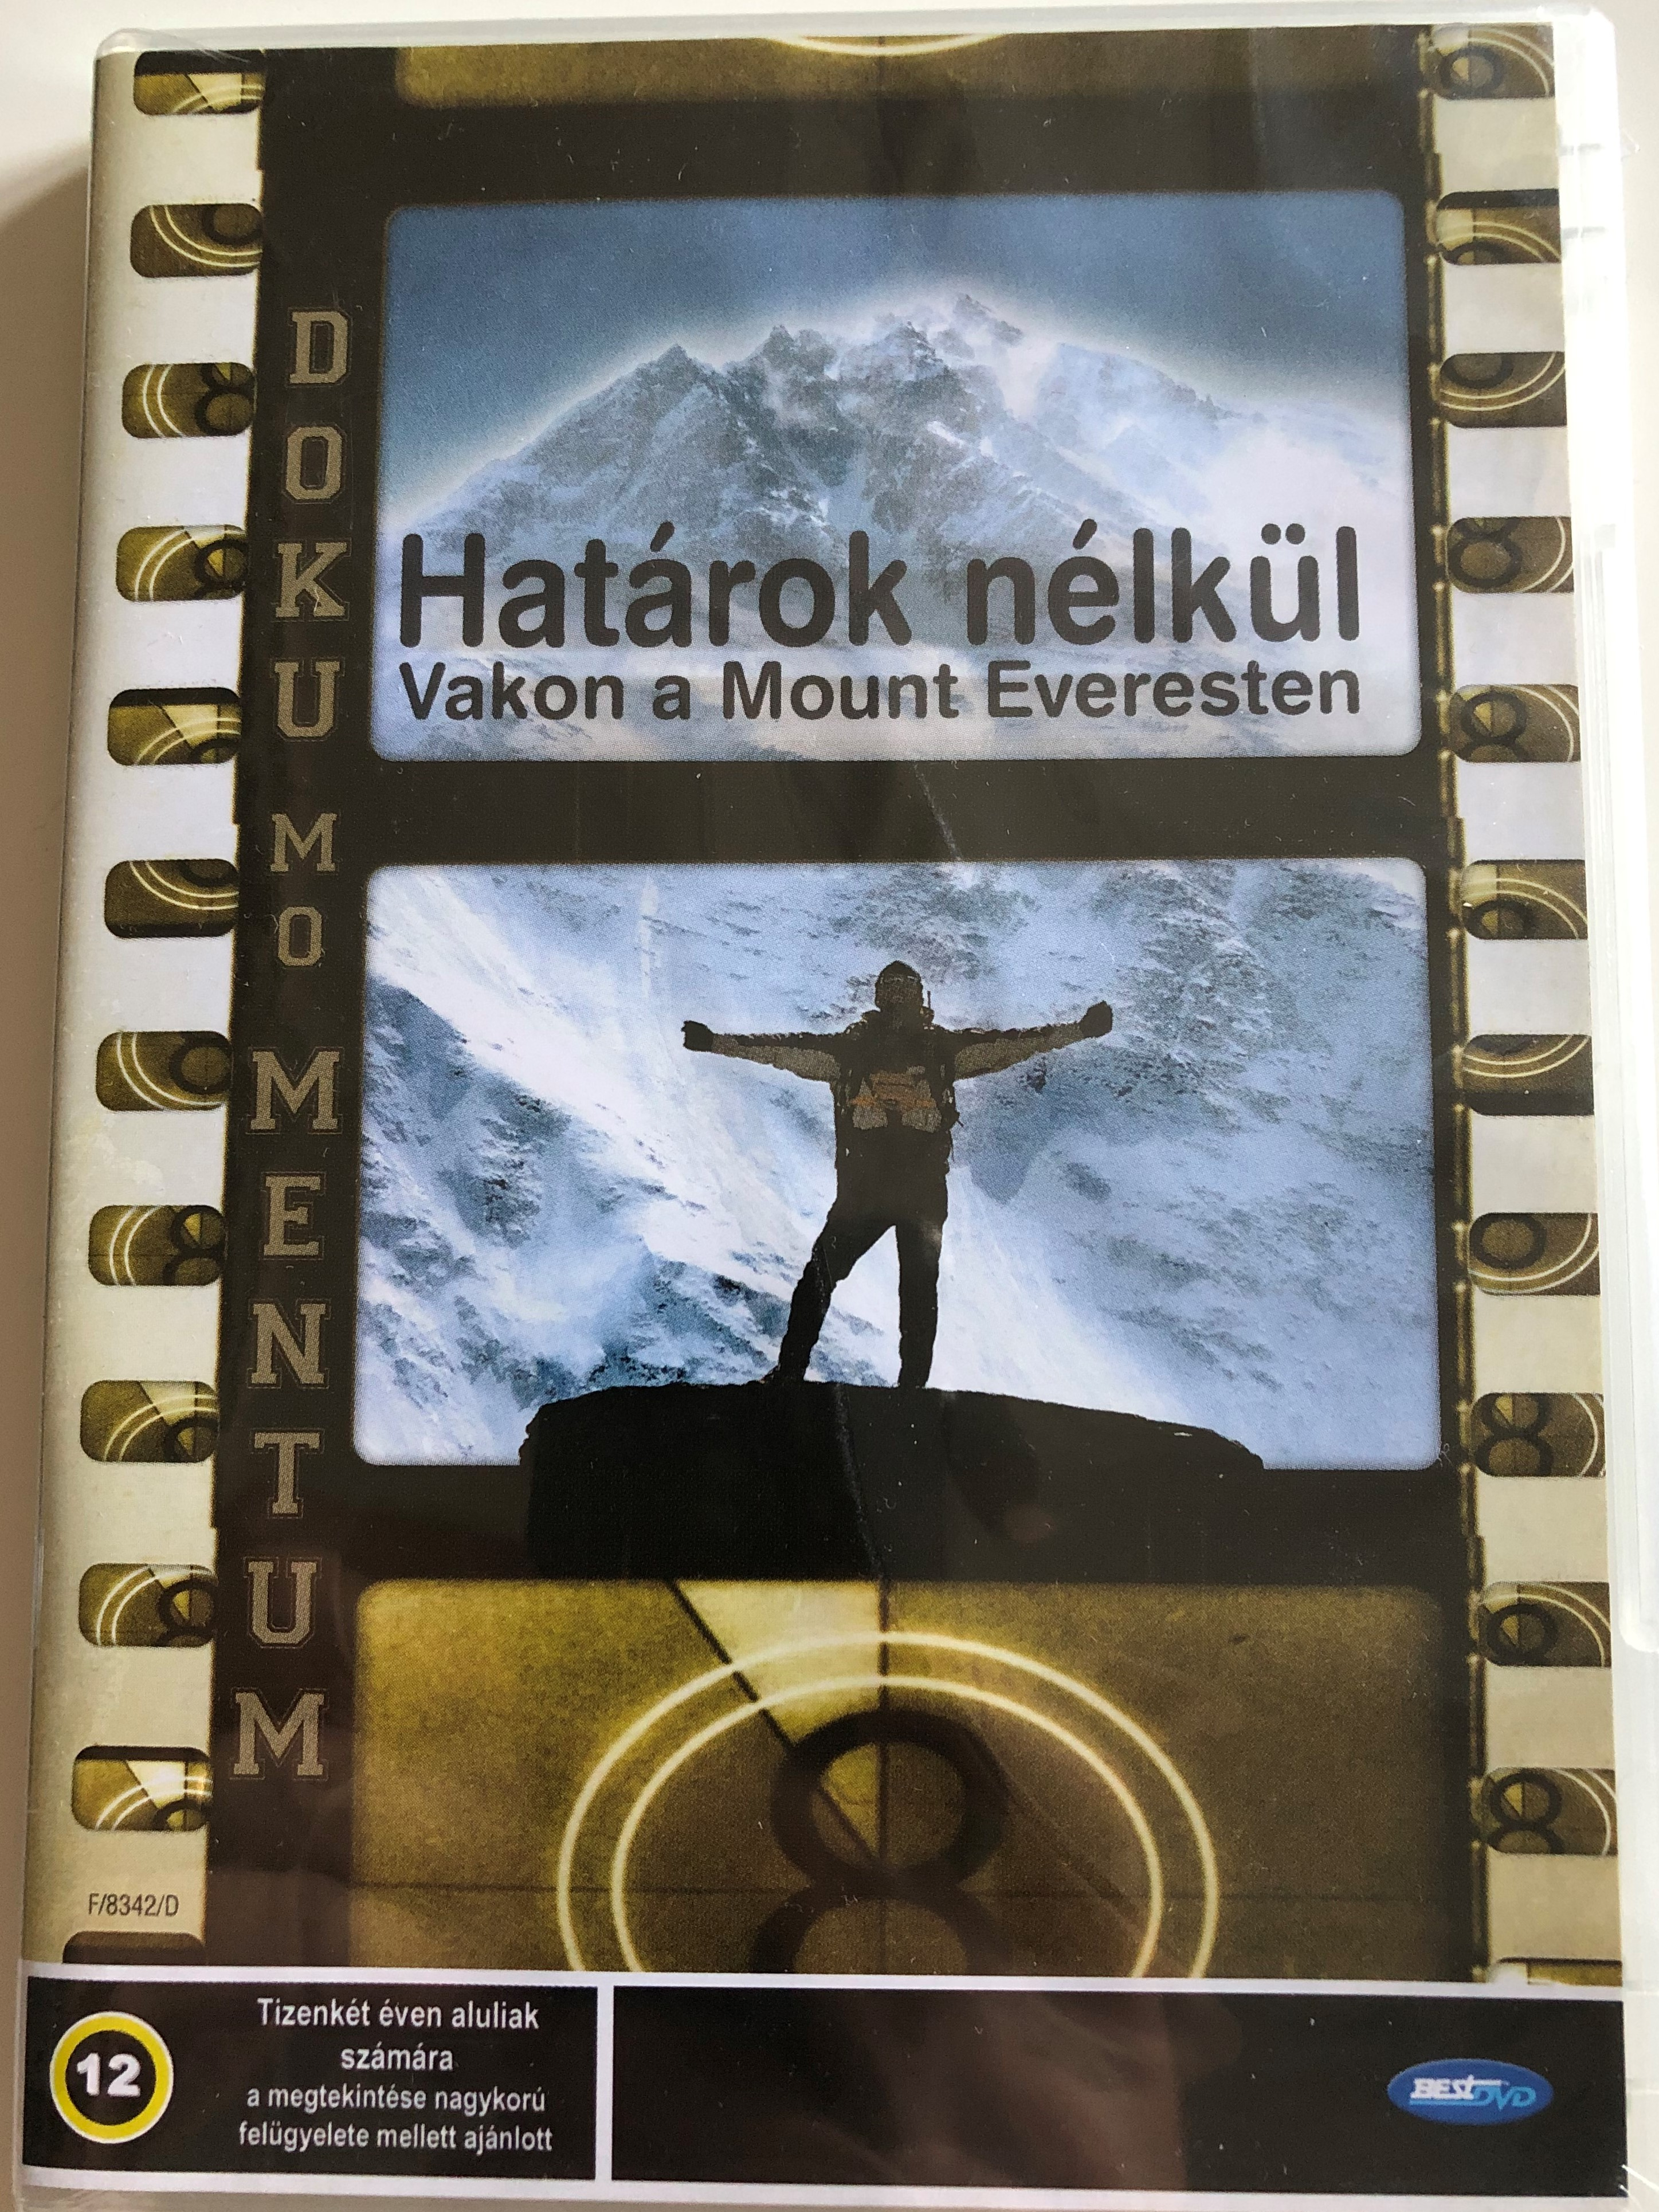 blindsight-dvd-2006-hat-rok-n-lk-l-vakon-a-mount-everesten-1.jpg